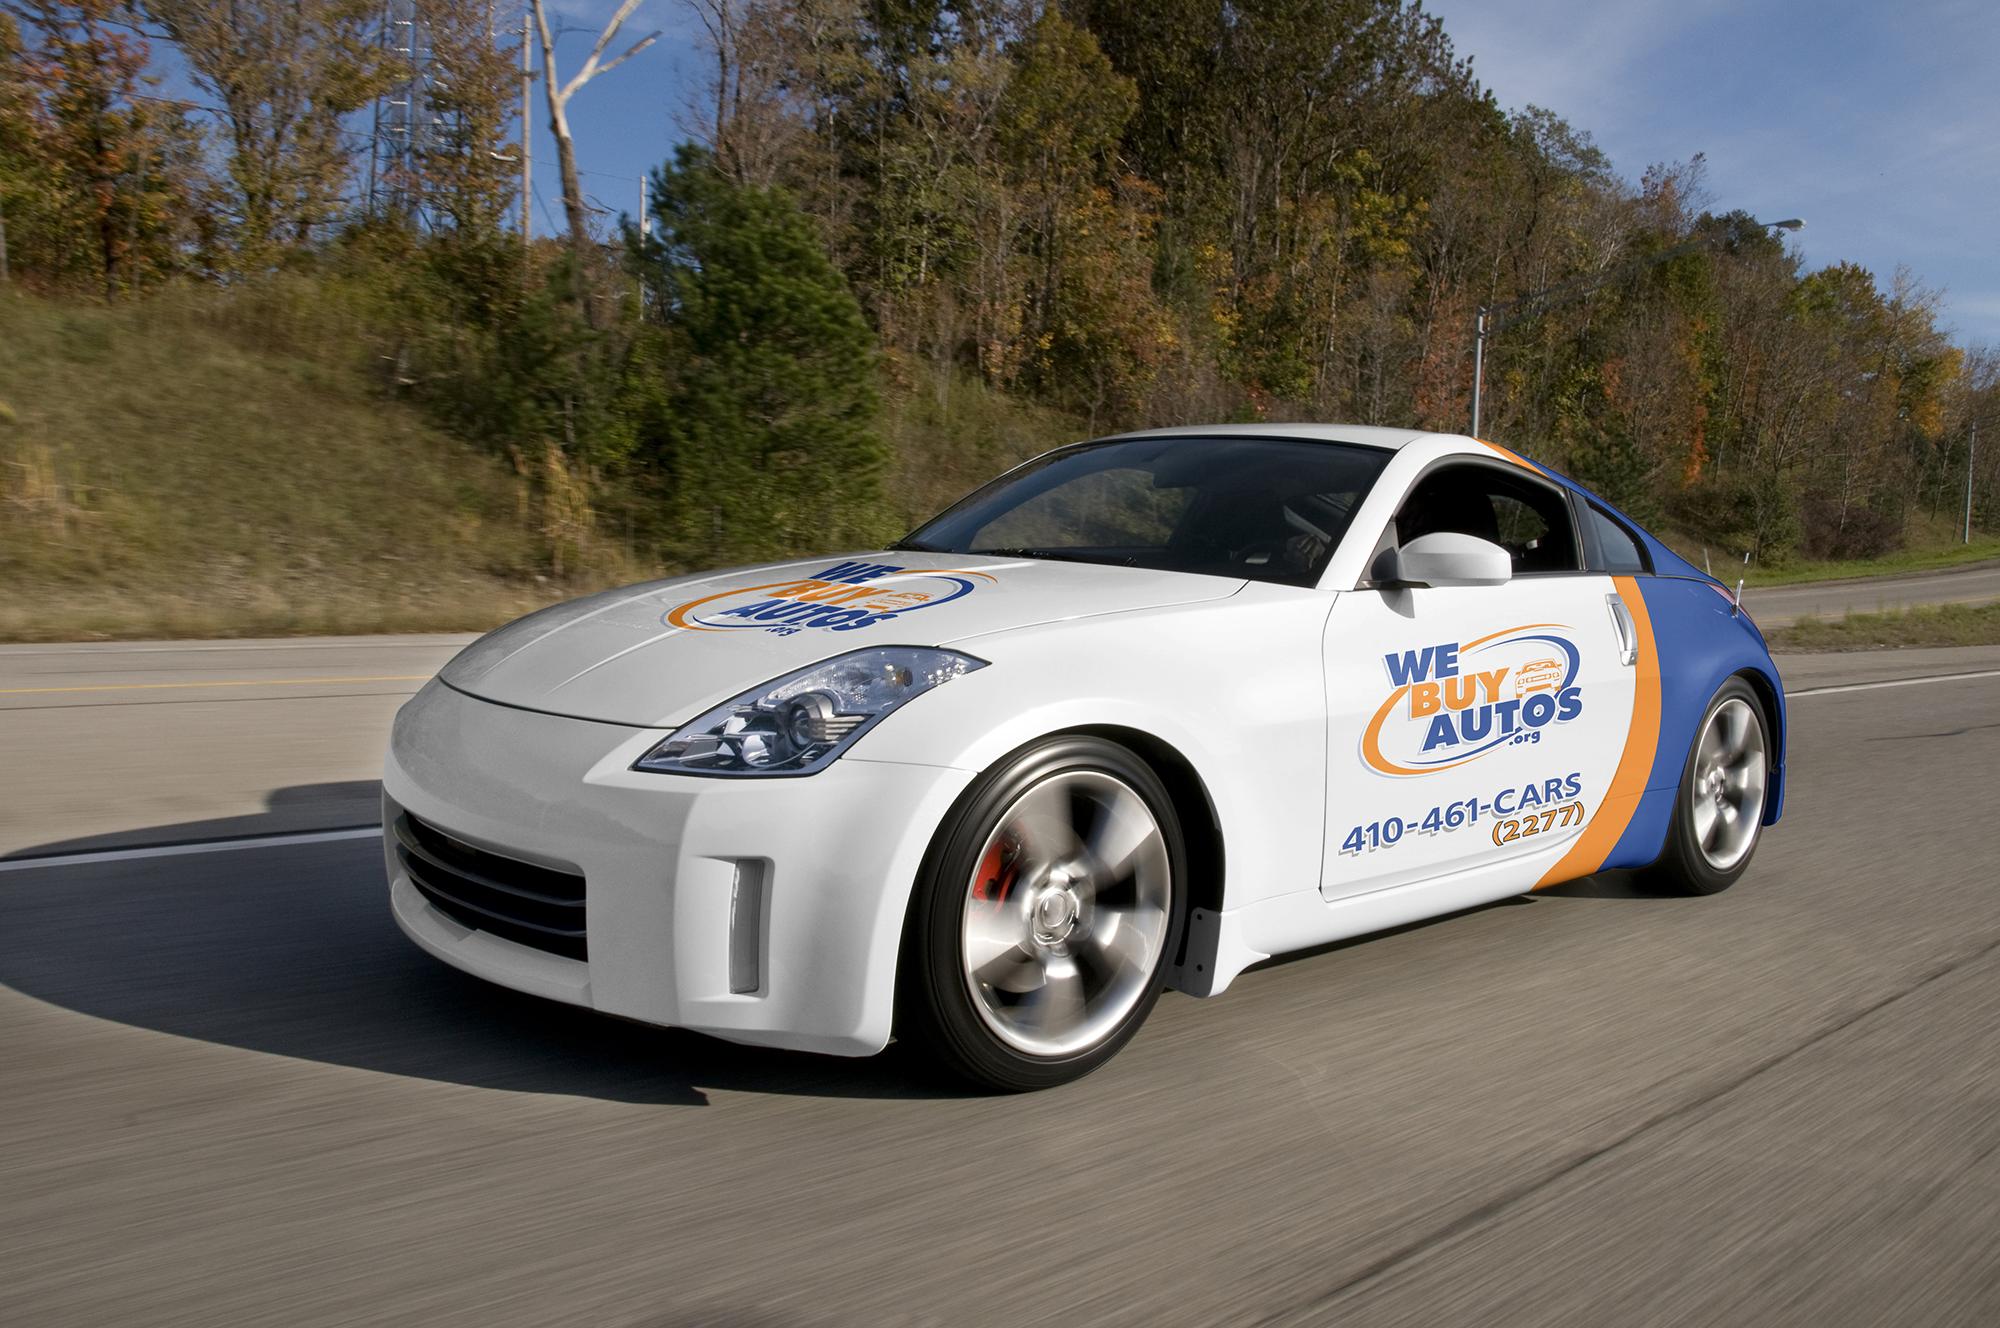 Car Options - We Buy Autos—Cash For Cars & Trucks BaltimoreWe Buy ...